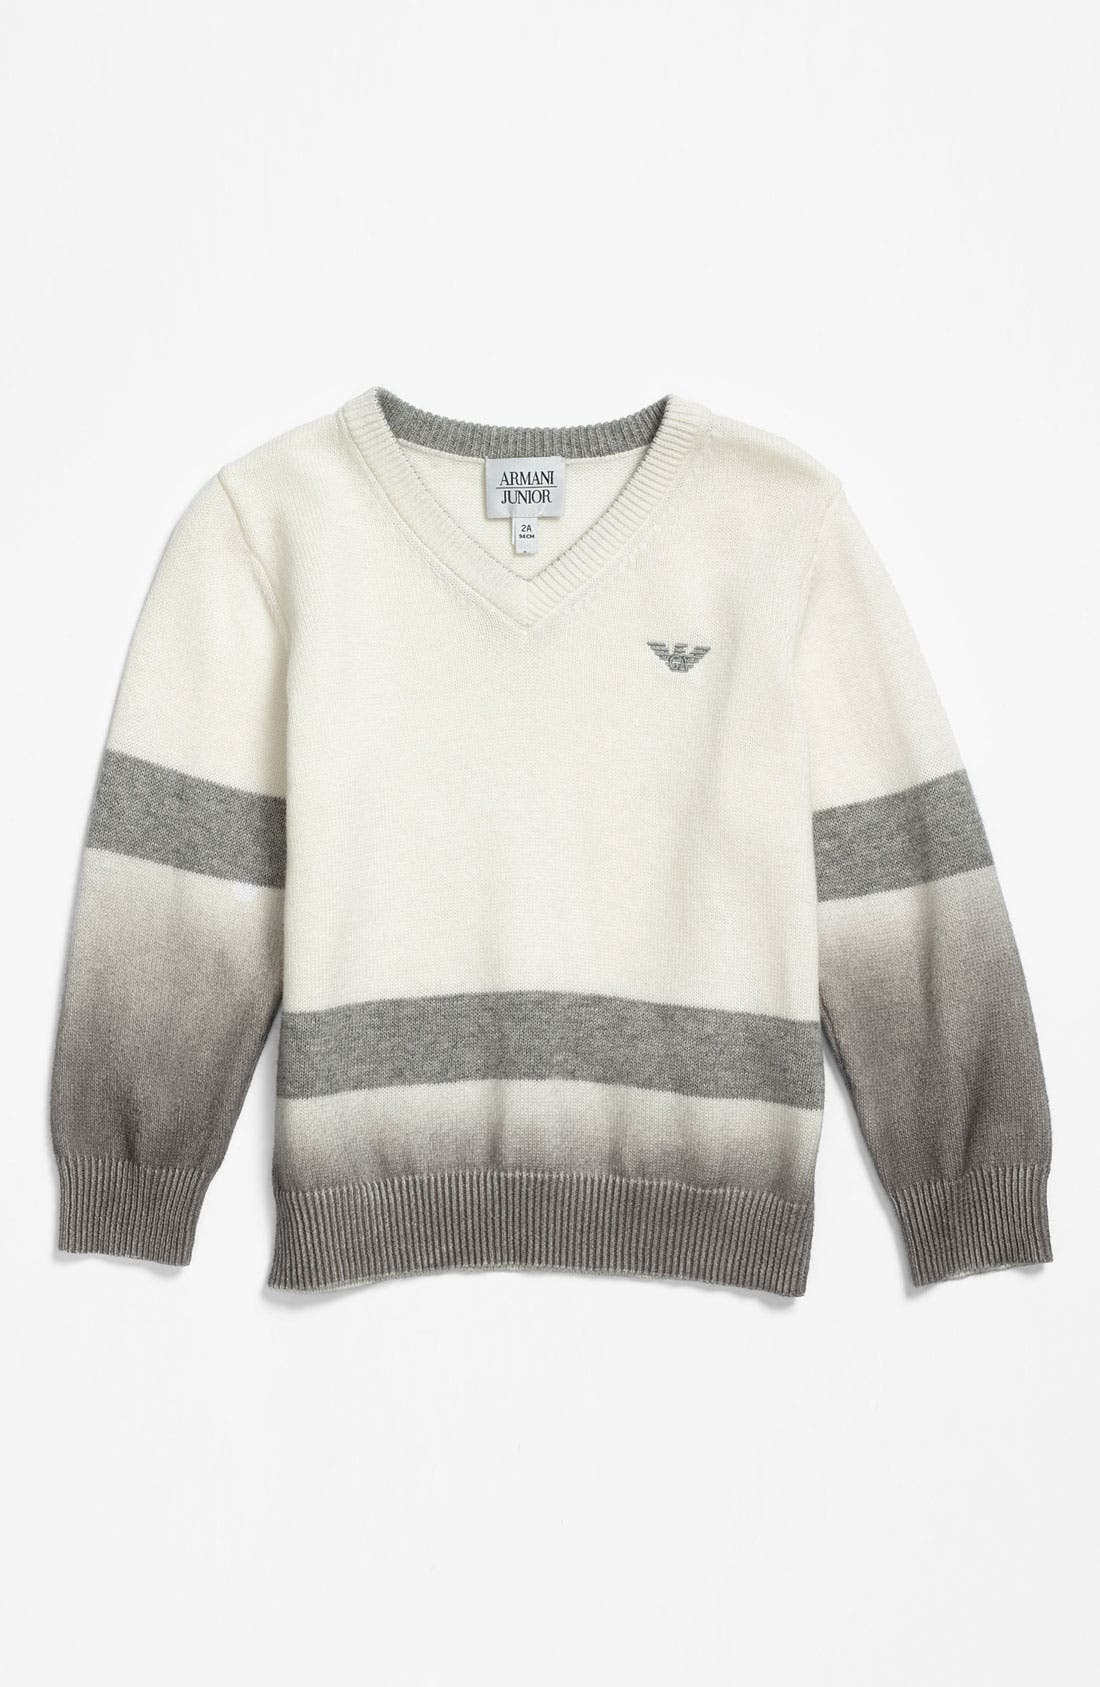 Alternate Image 1 Selected - Armani Junior V-Neck Sweater (Little Boys)